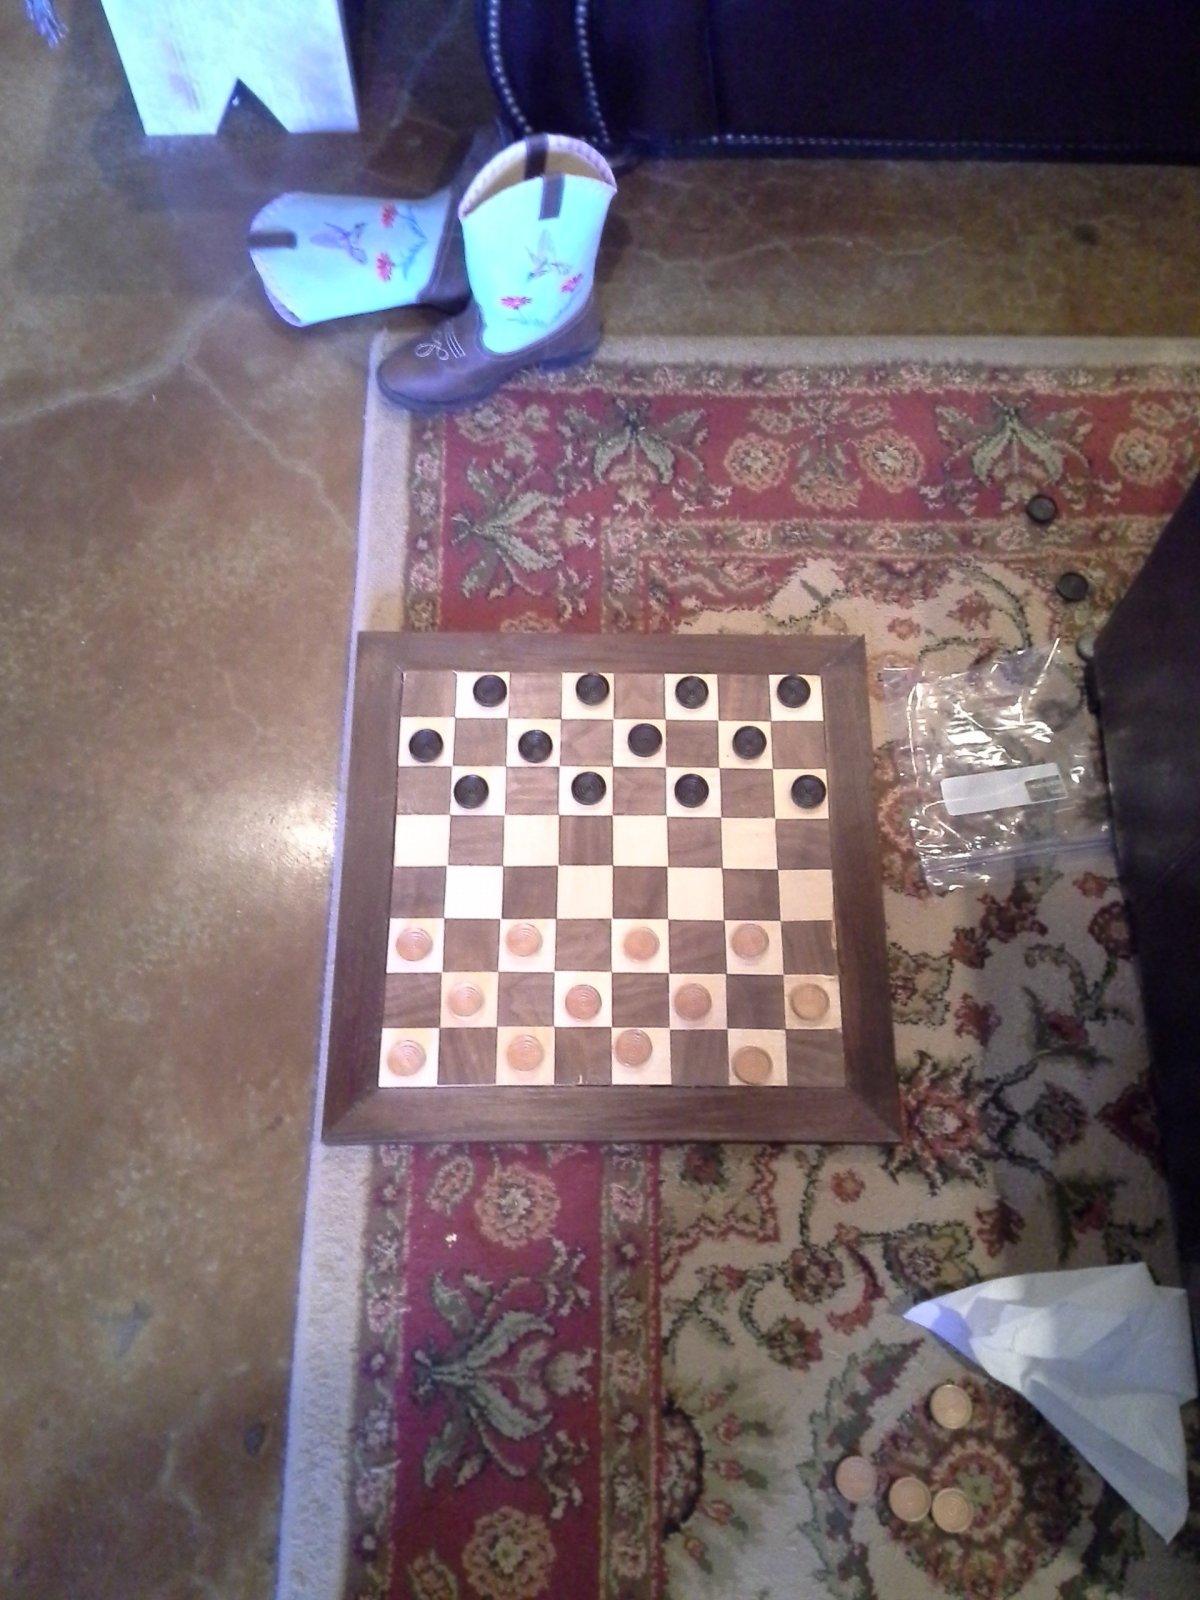 Checkerboard by Michael York